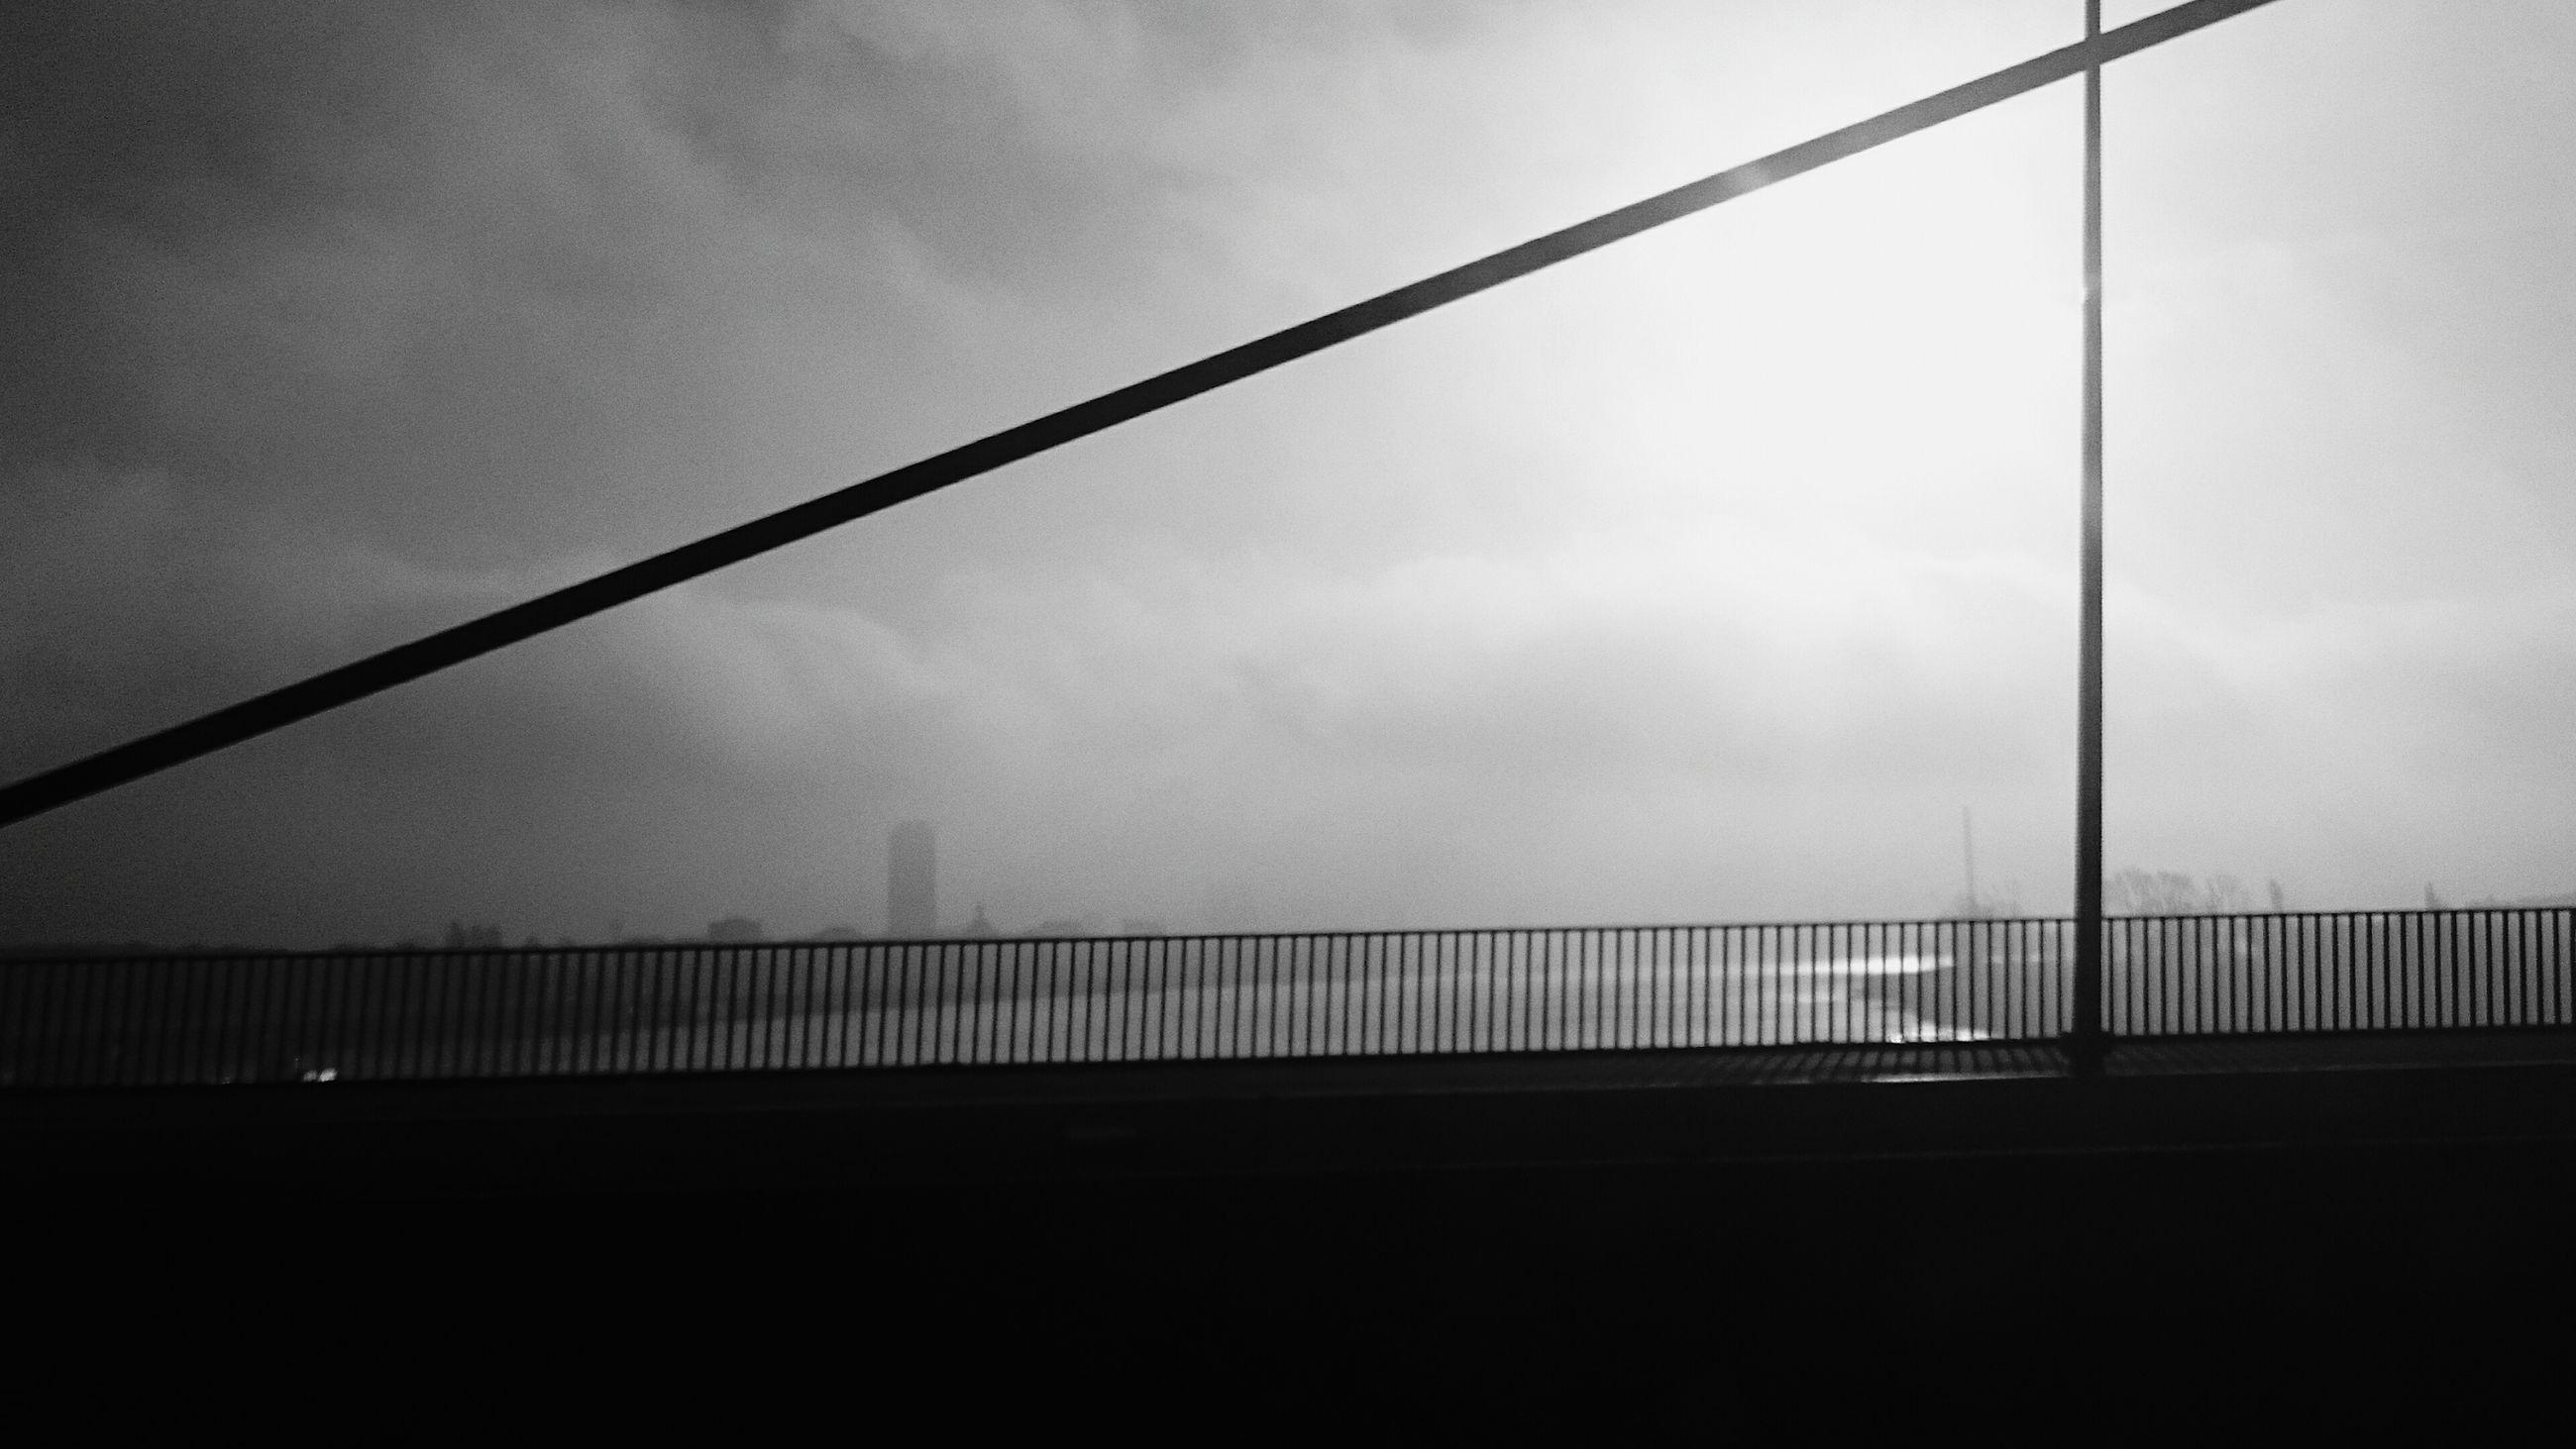 bridge - man made structure, sky, suspension bridge, connection, cloud - sky, transportation, no people, built structure, outdoors, day, architecture, river, water, bridge, nature